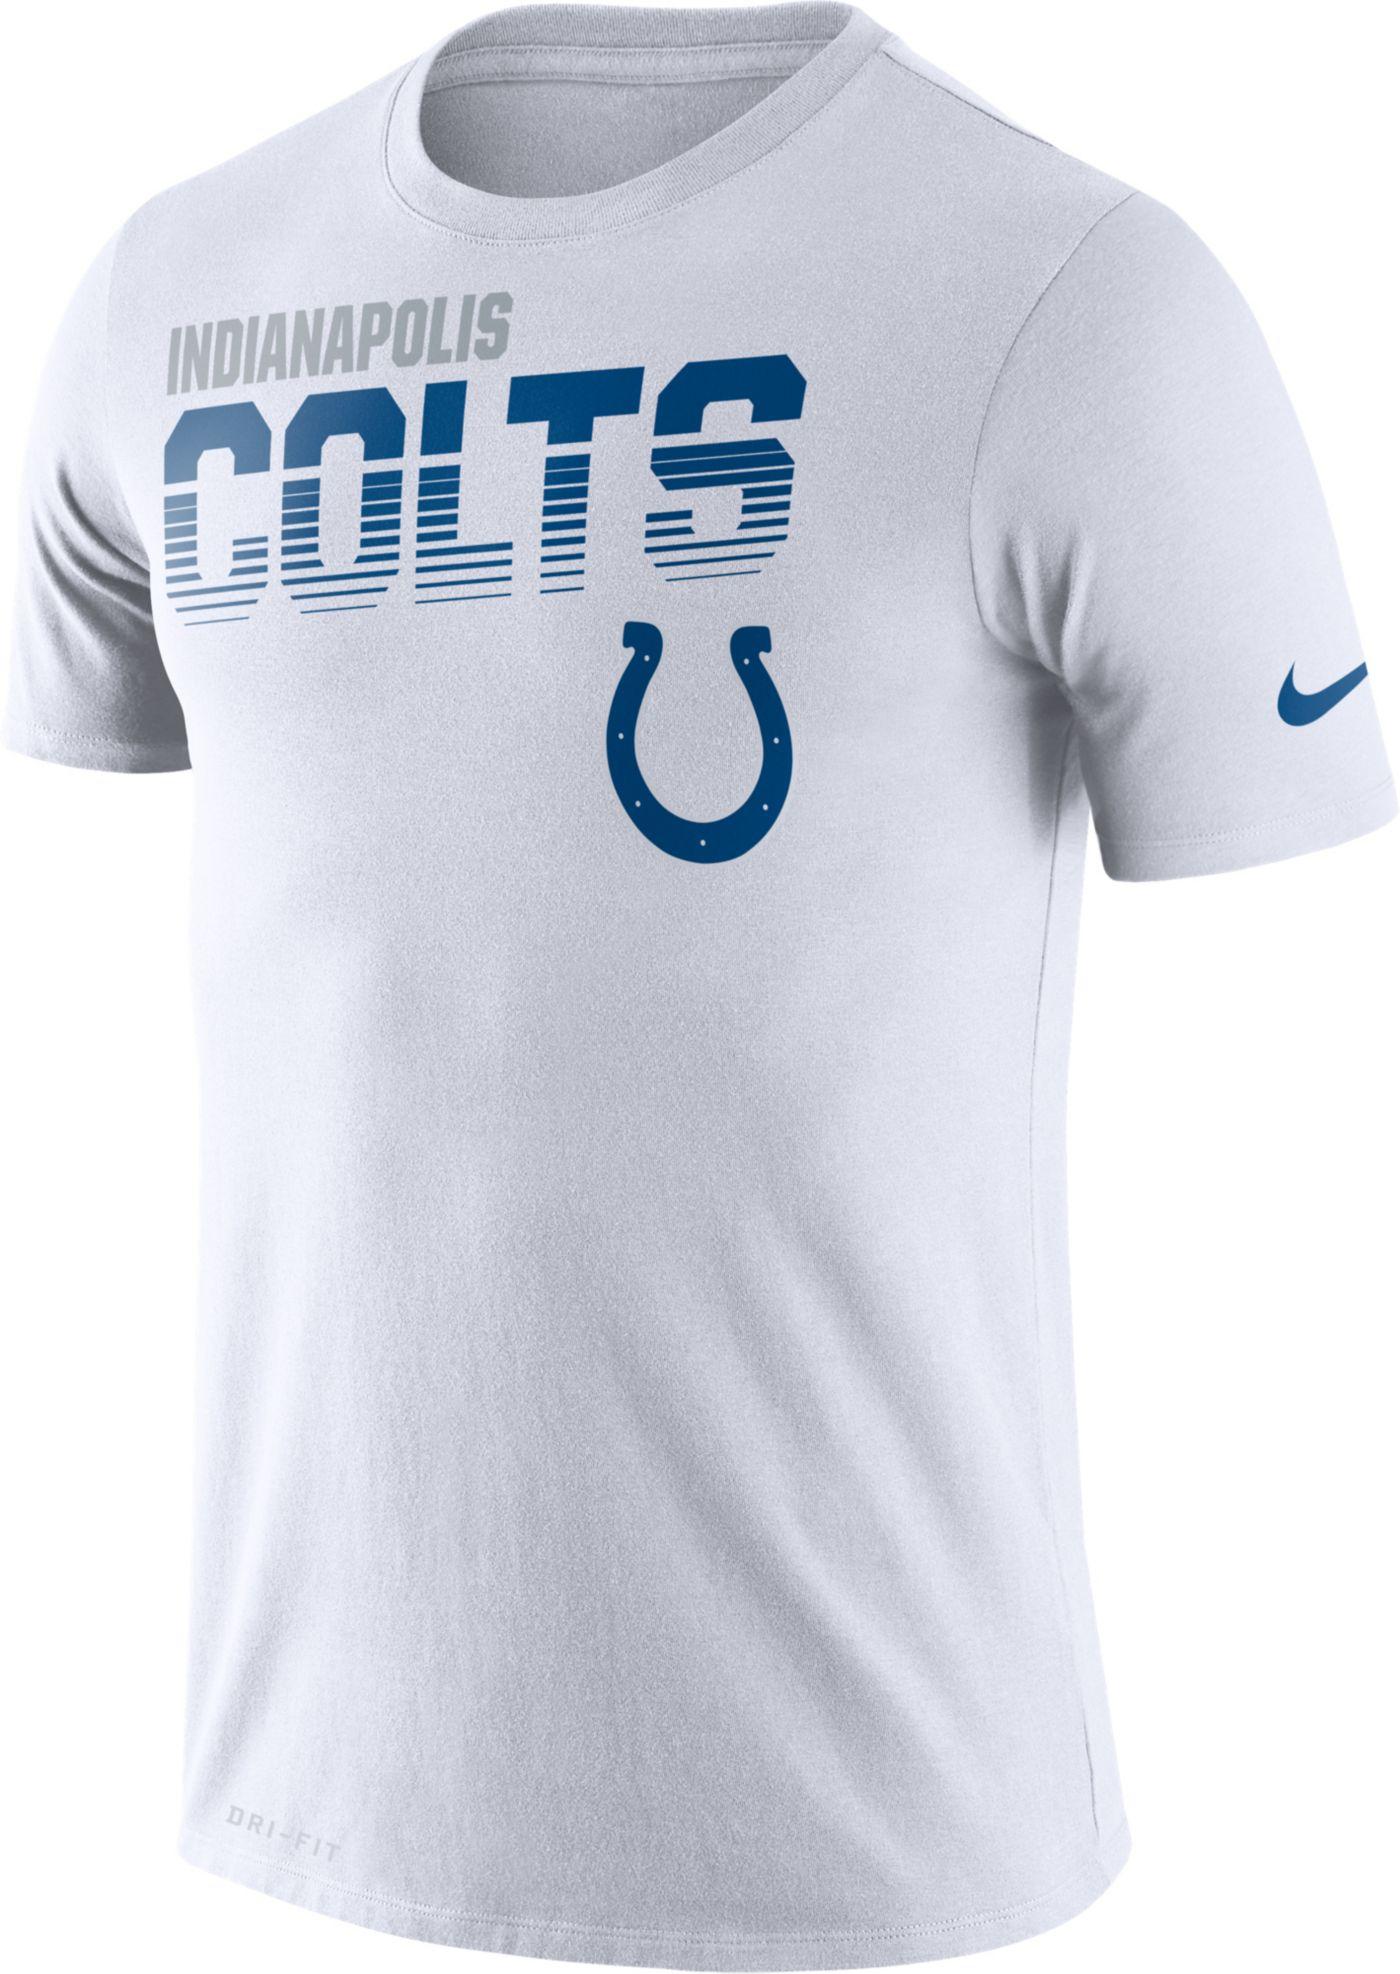 Nike Men's Indianapolis Colts Sideline Legend Performance White T-Shirt